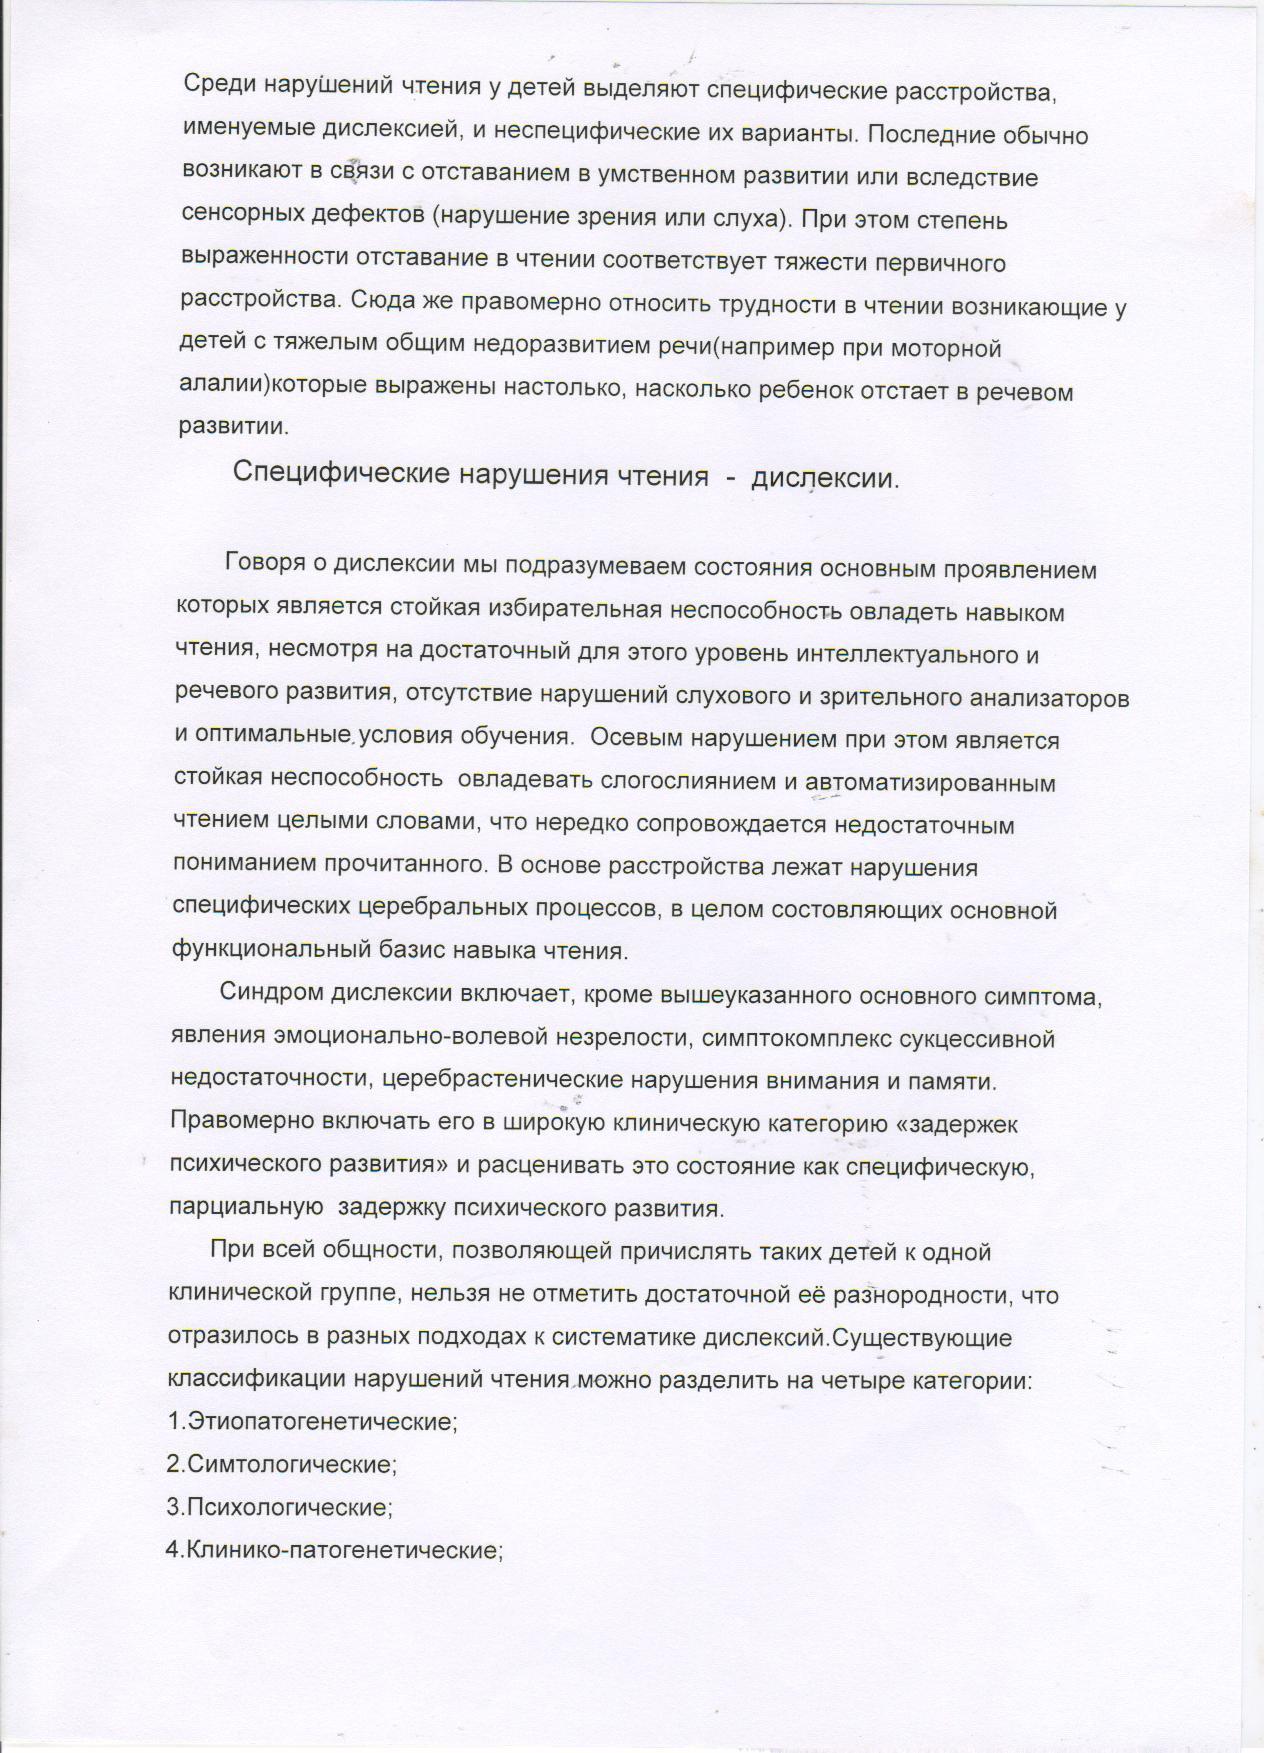 C:\Documents and Settings\Администратор\Рабочий стол\Тептякова Е.А. 004.jpg